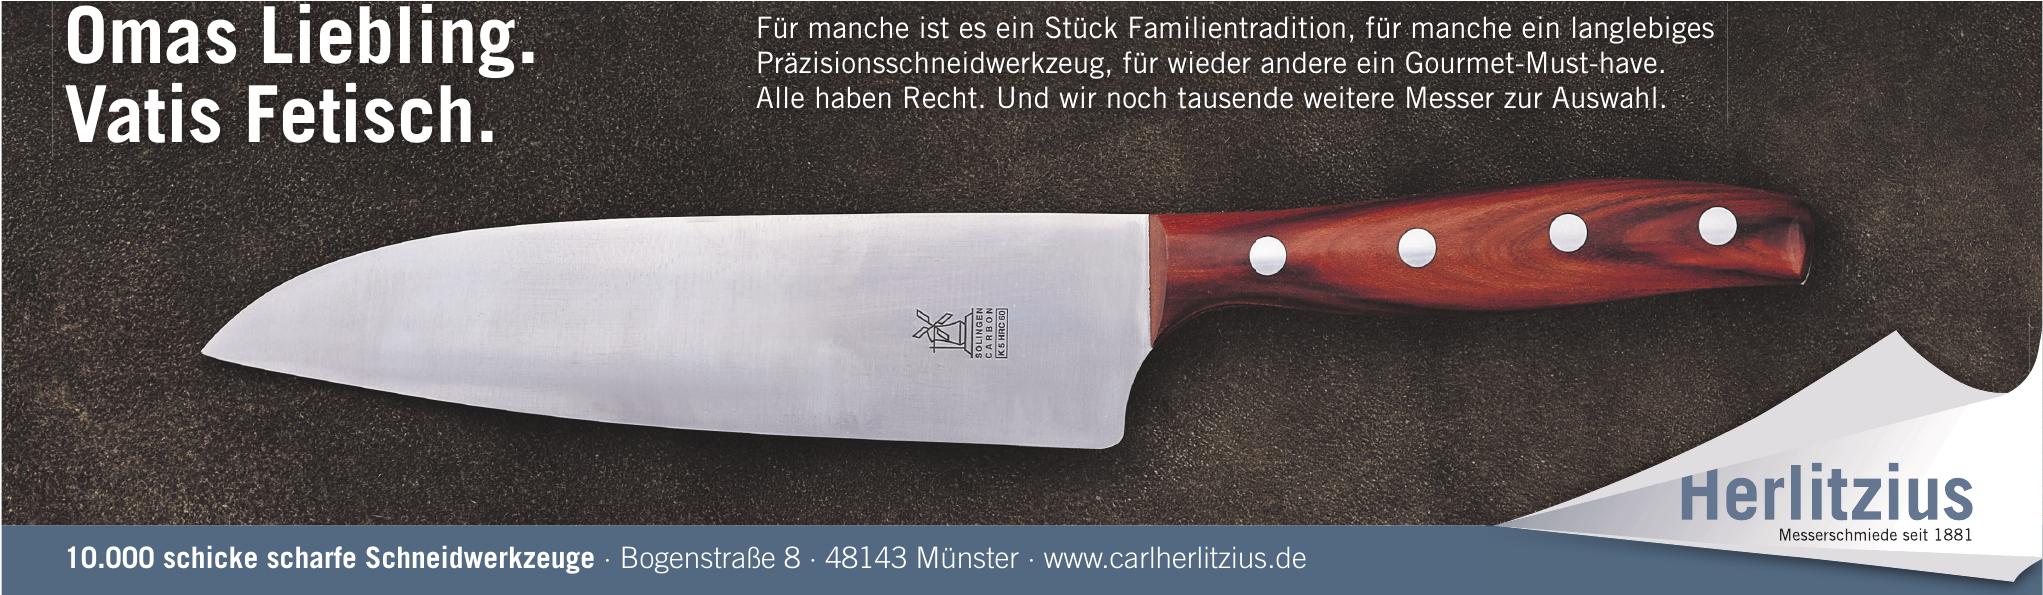 Carl Herlitzius GmbH & Co. KG